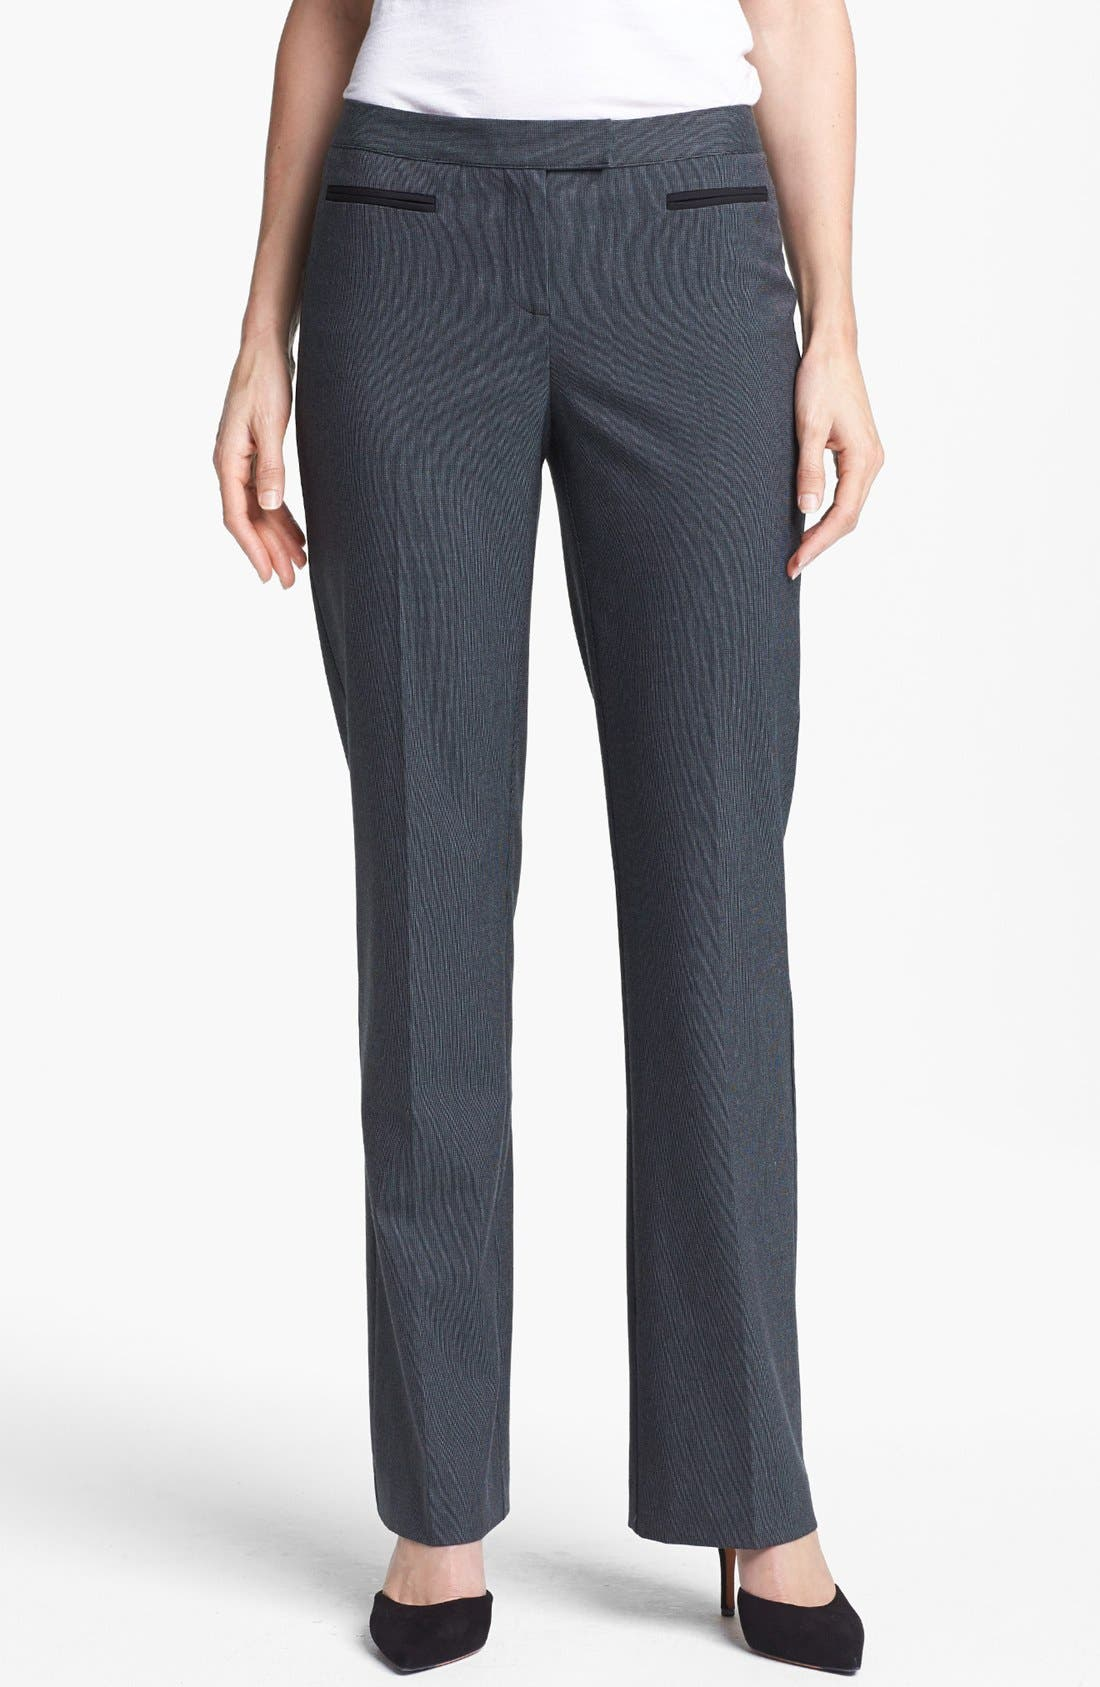 Alternate Image 1 Selected - Halogen® 'Taylor - Fox Hunt' Curvy Fit Pants (Regular & Petite)